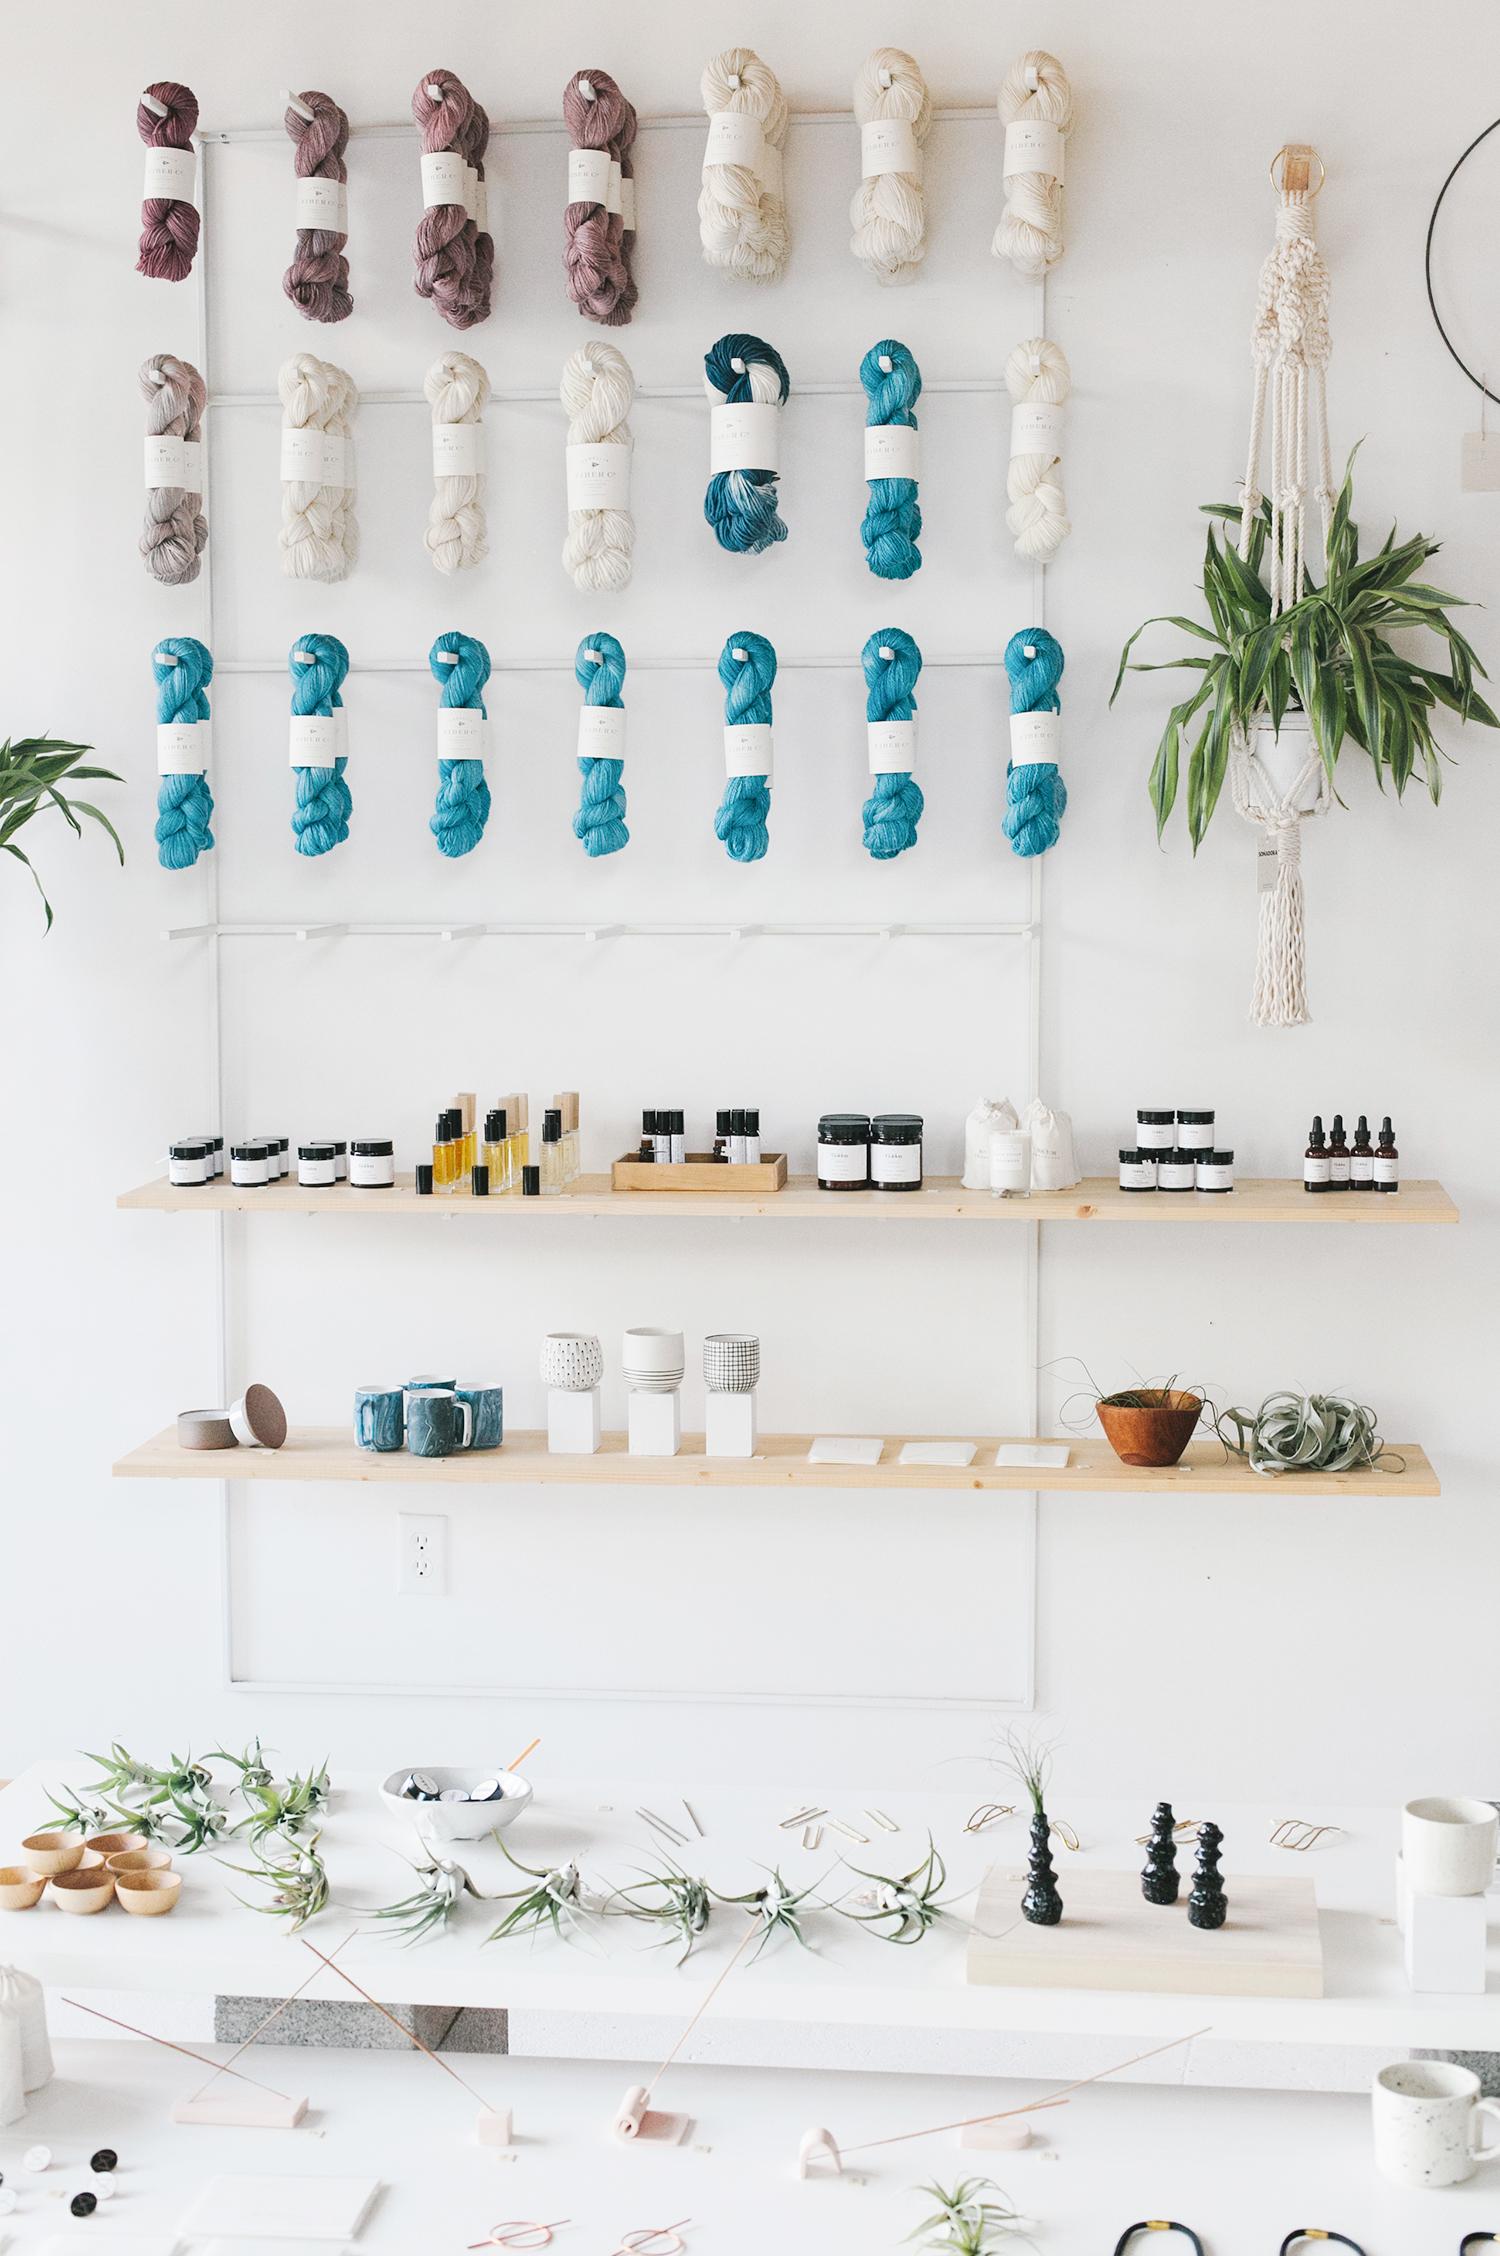 Shop Stops - KOEL yarn shops around the globe